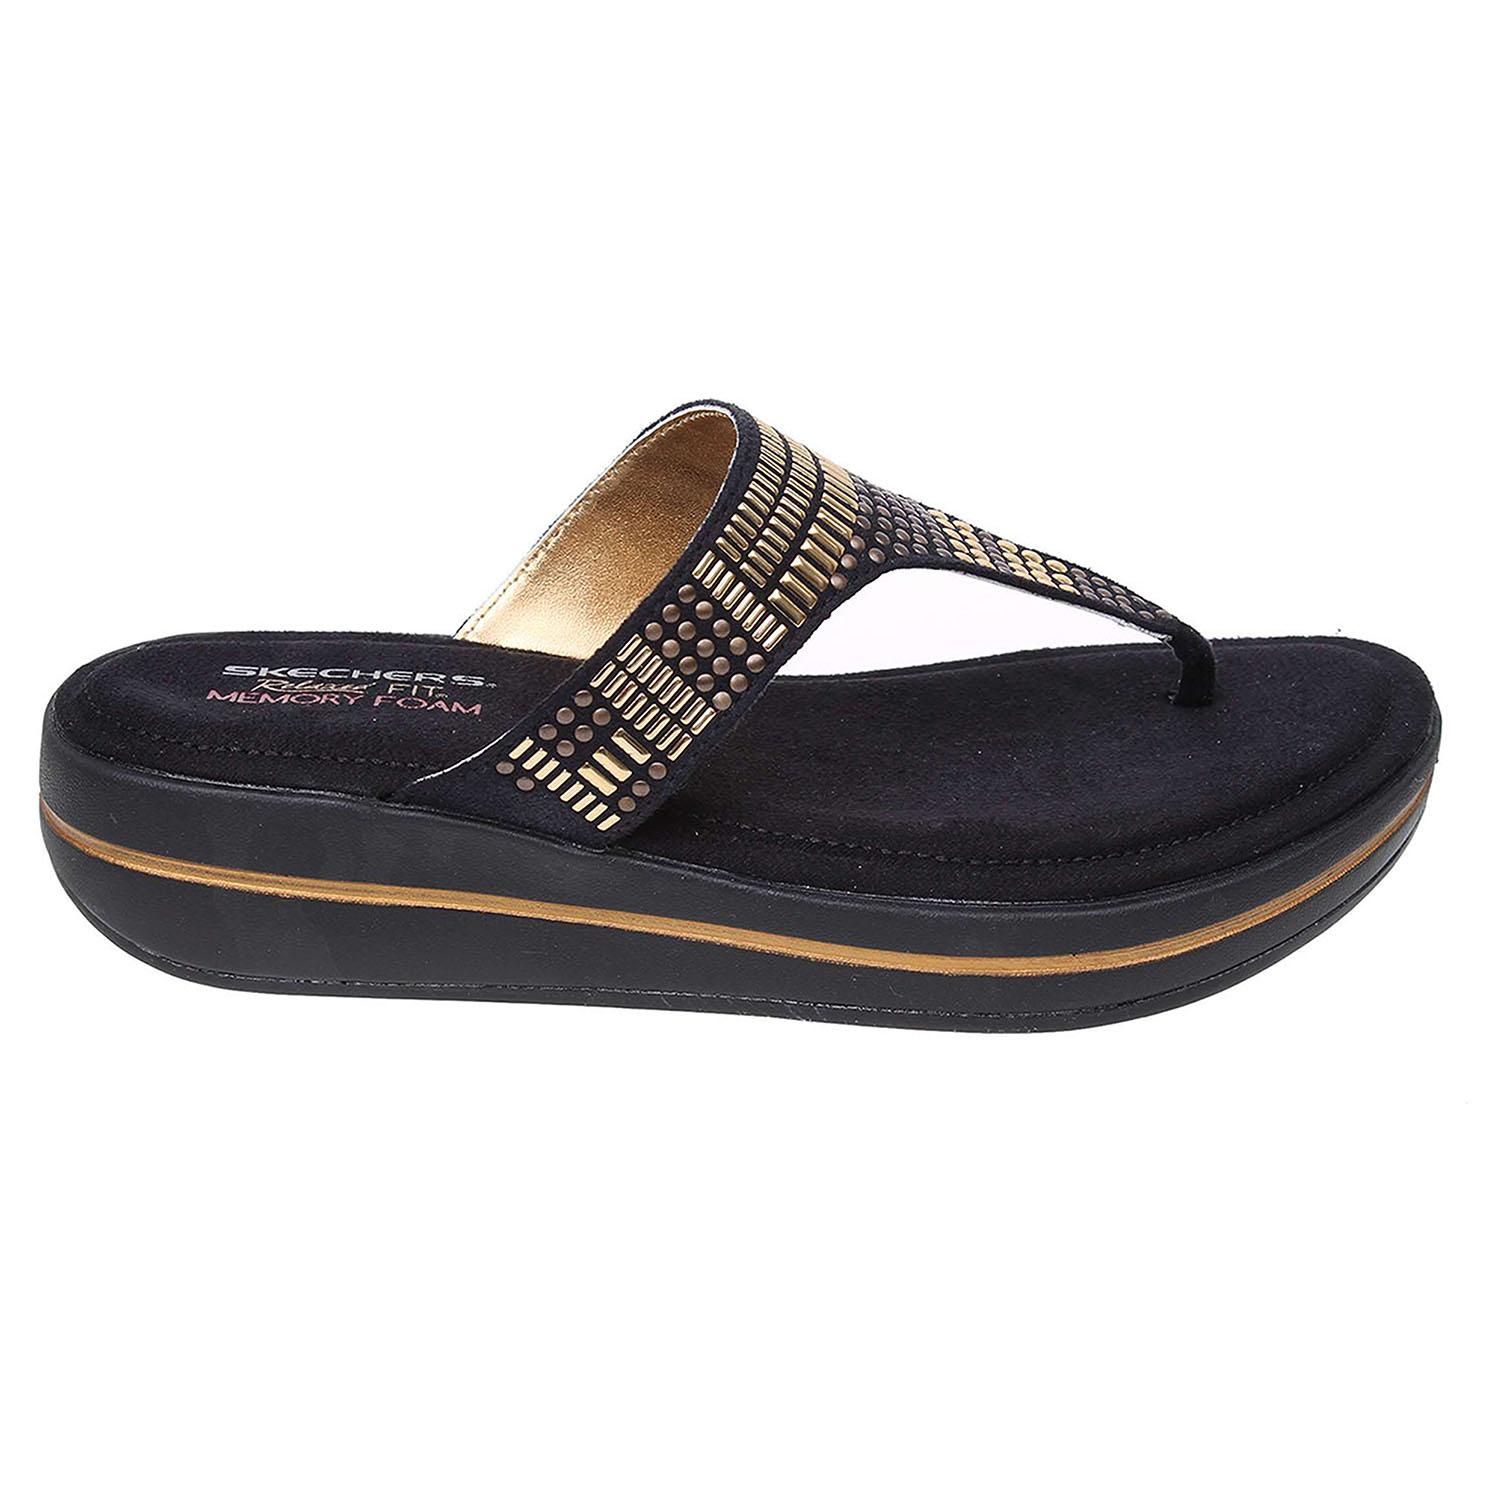 Skechers Studly black-gold 40